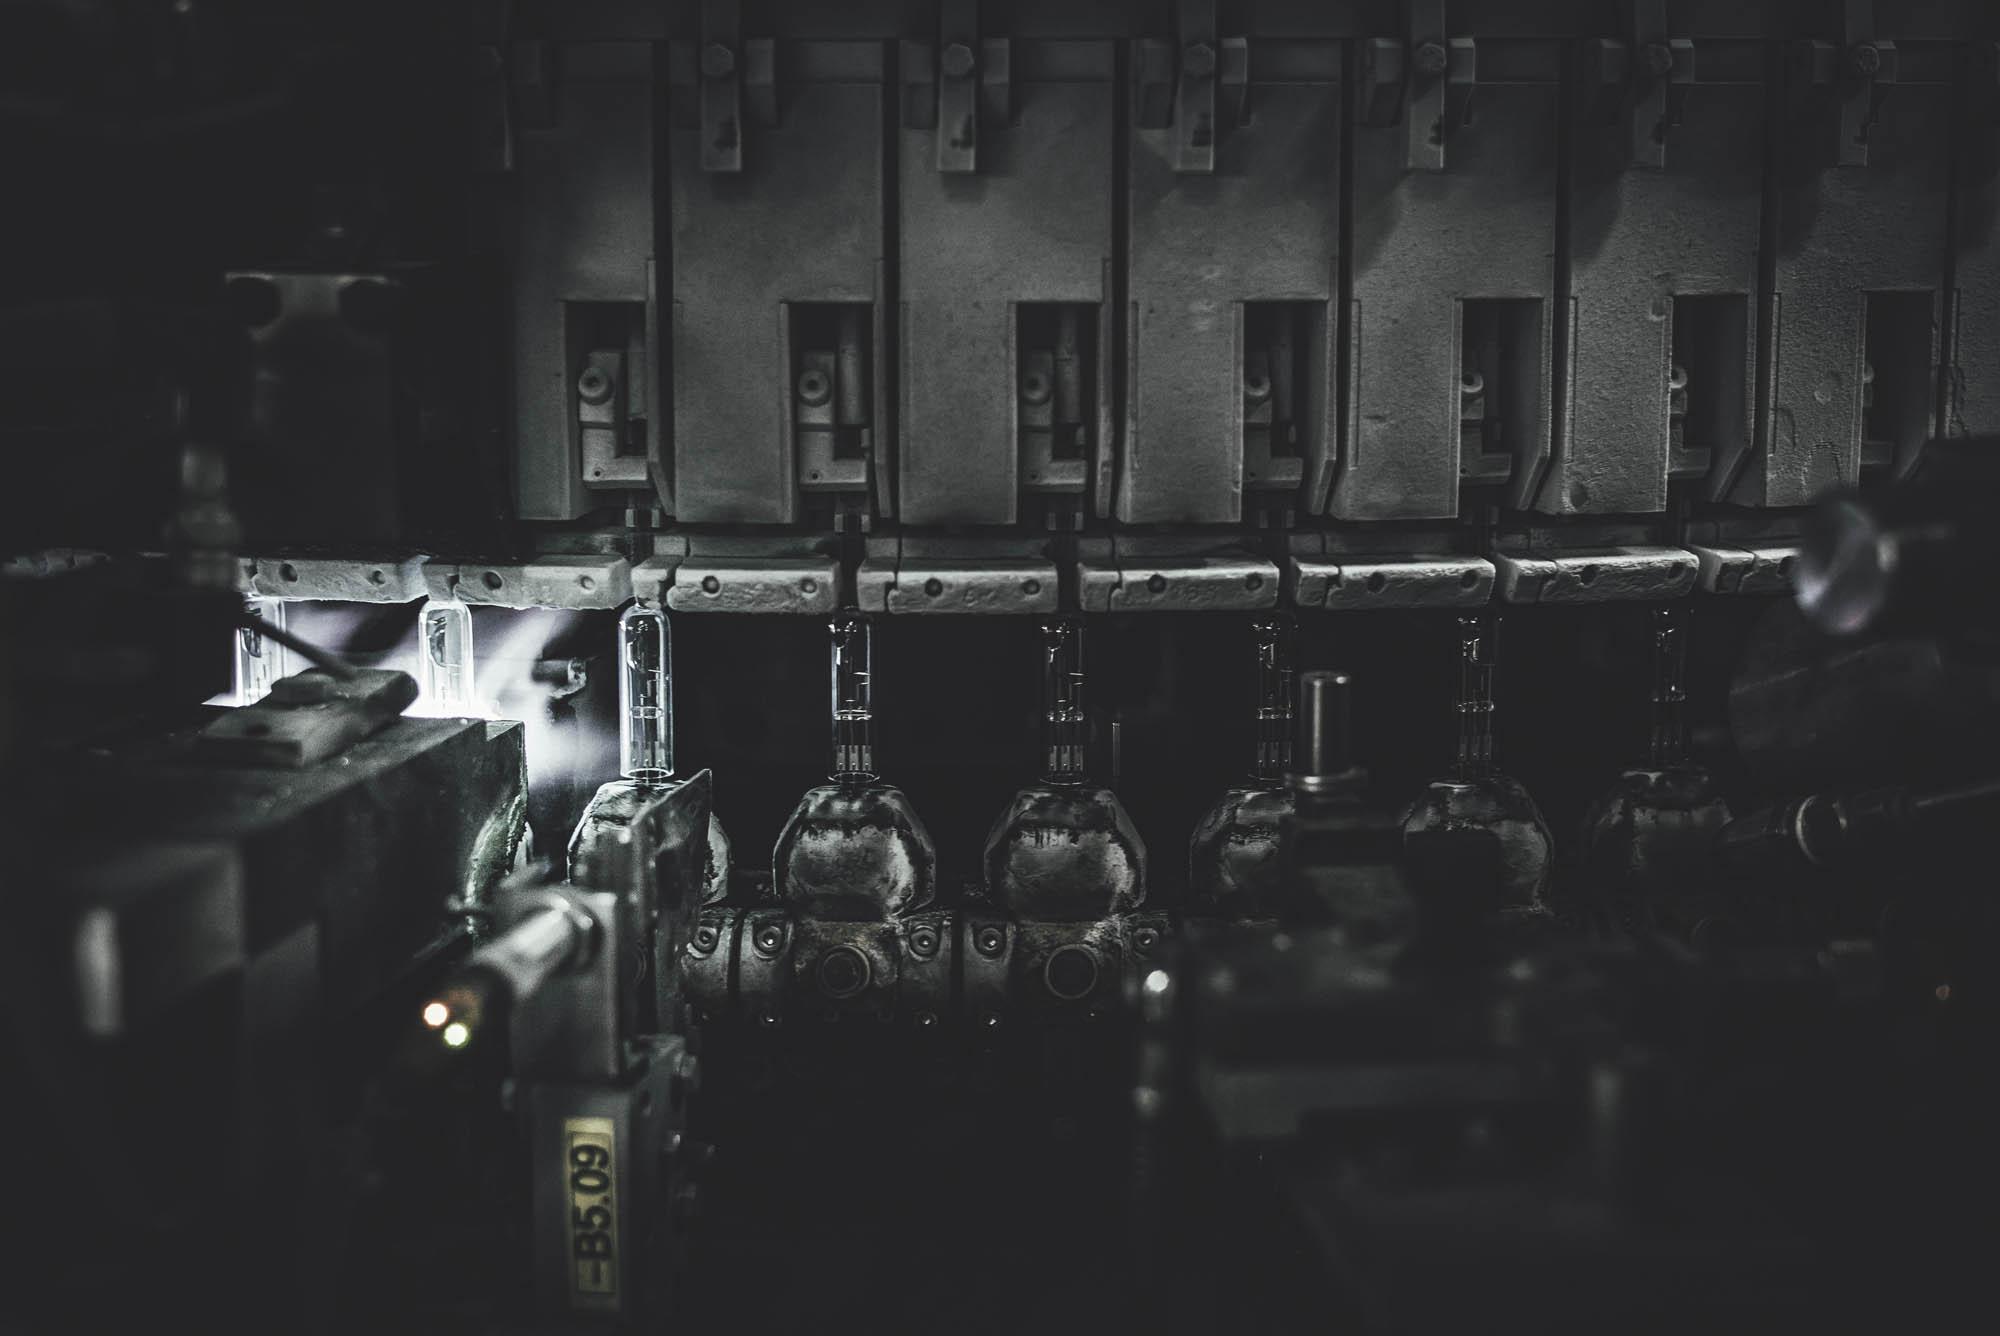 seifertuebler-corporate-osram-filamentbulb-13.jpg